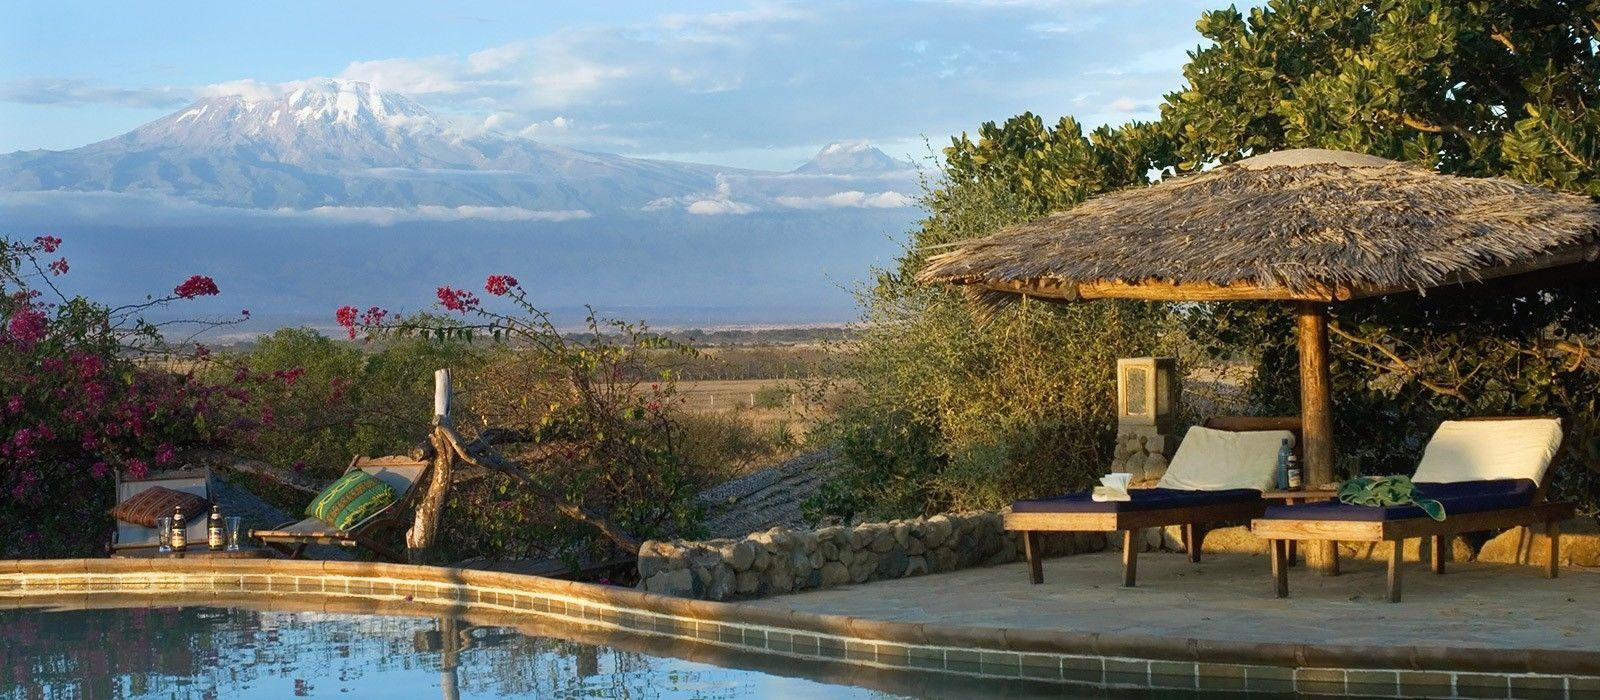 Tansania: Spannende Safaris & romantischer Sansibar Urlaub Urlaub 1